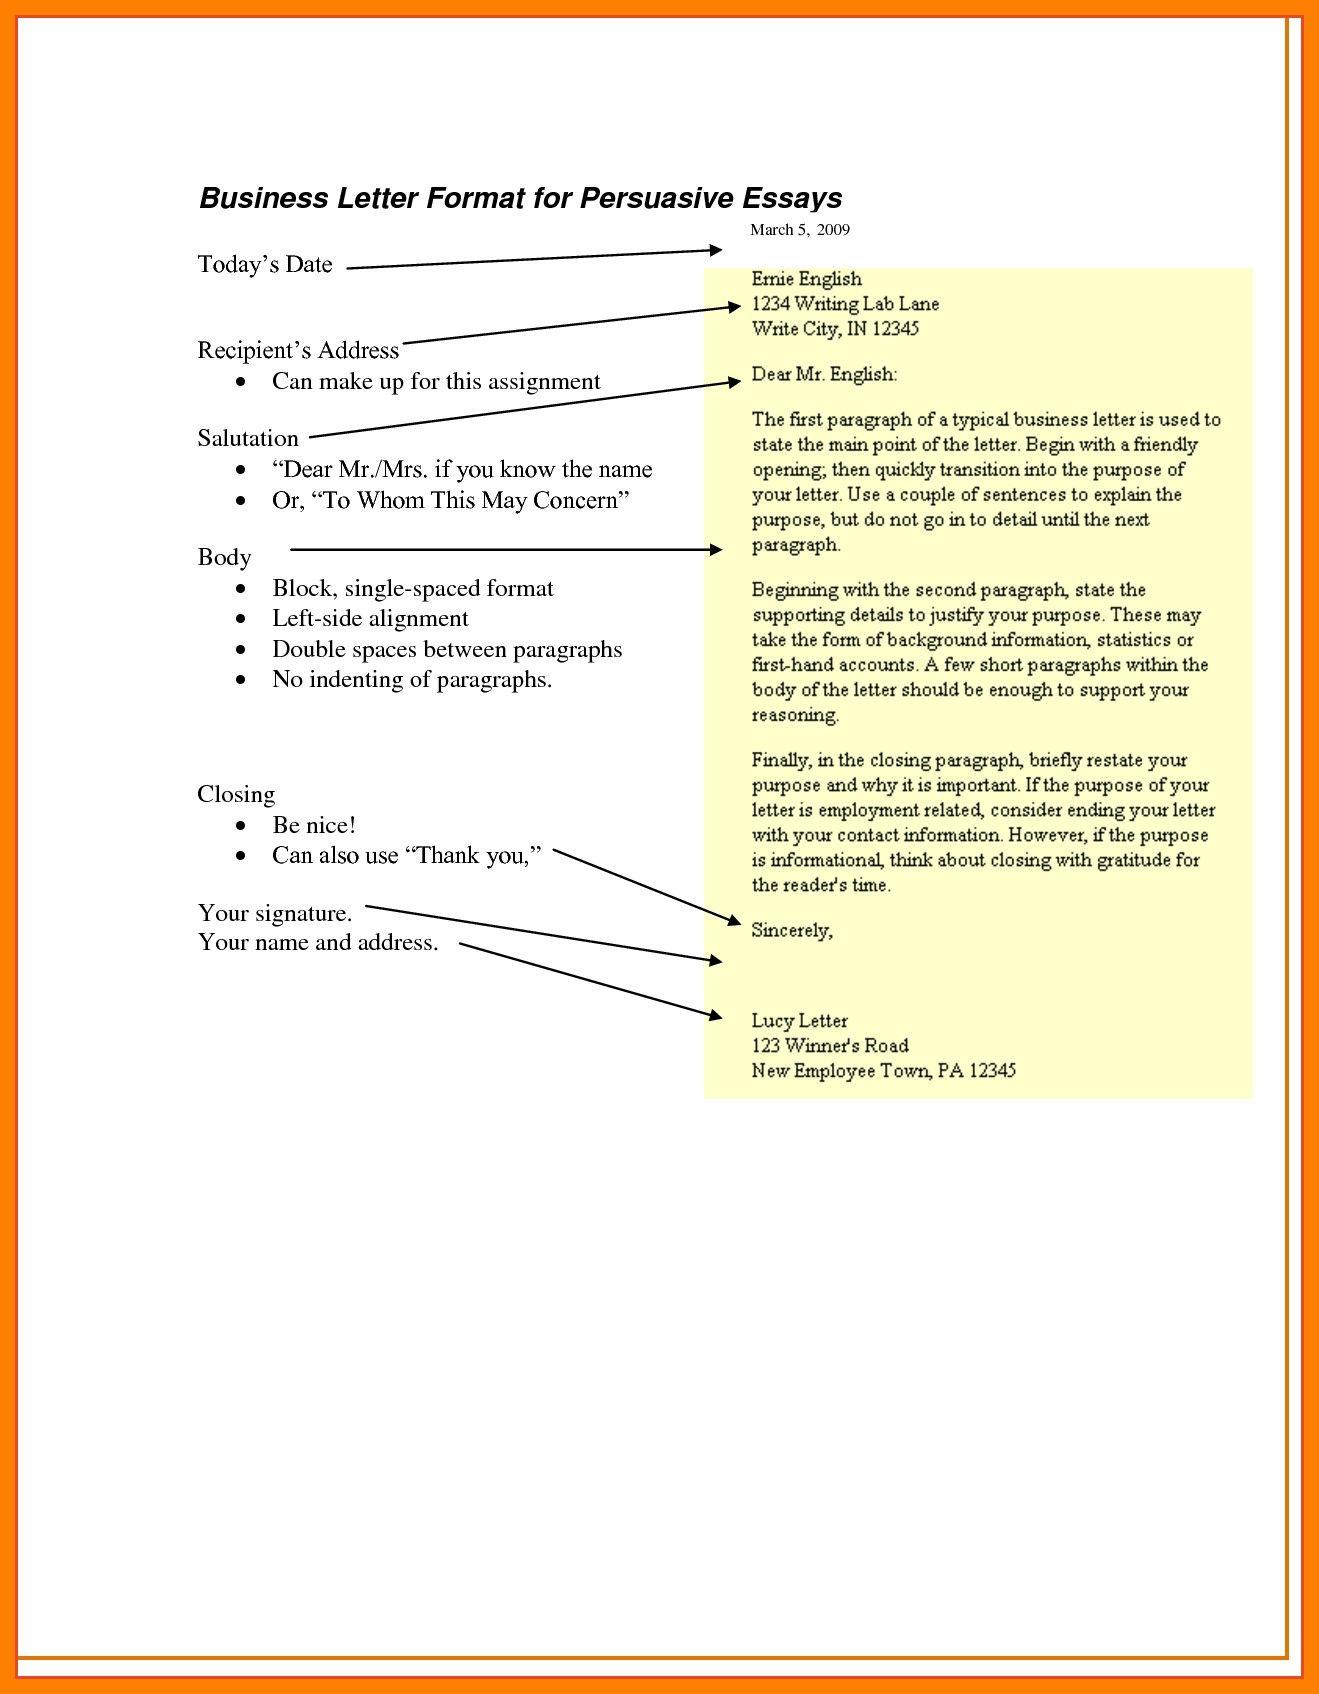 Example Persuasive Business Letter format Best 7 Persuasive Letter